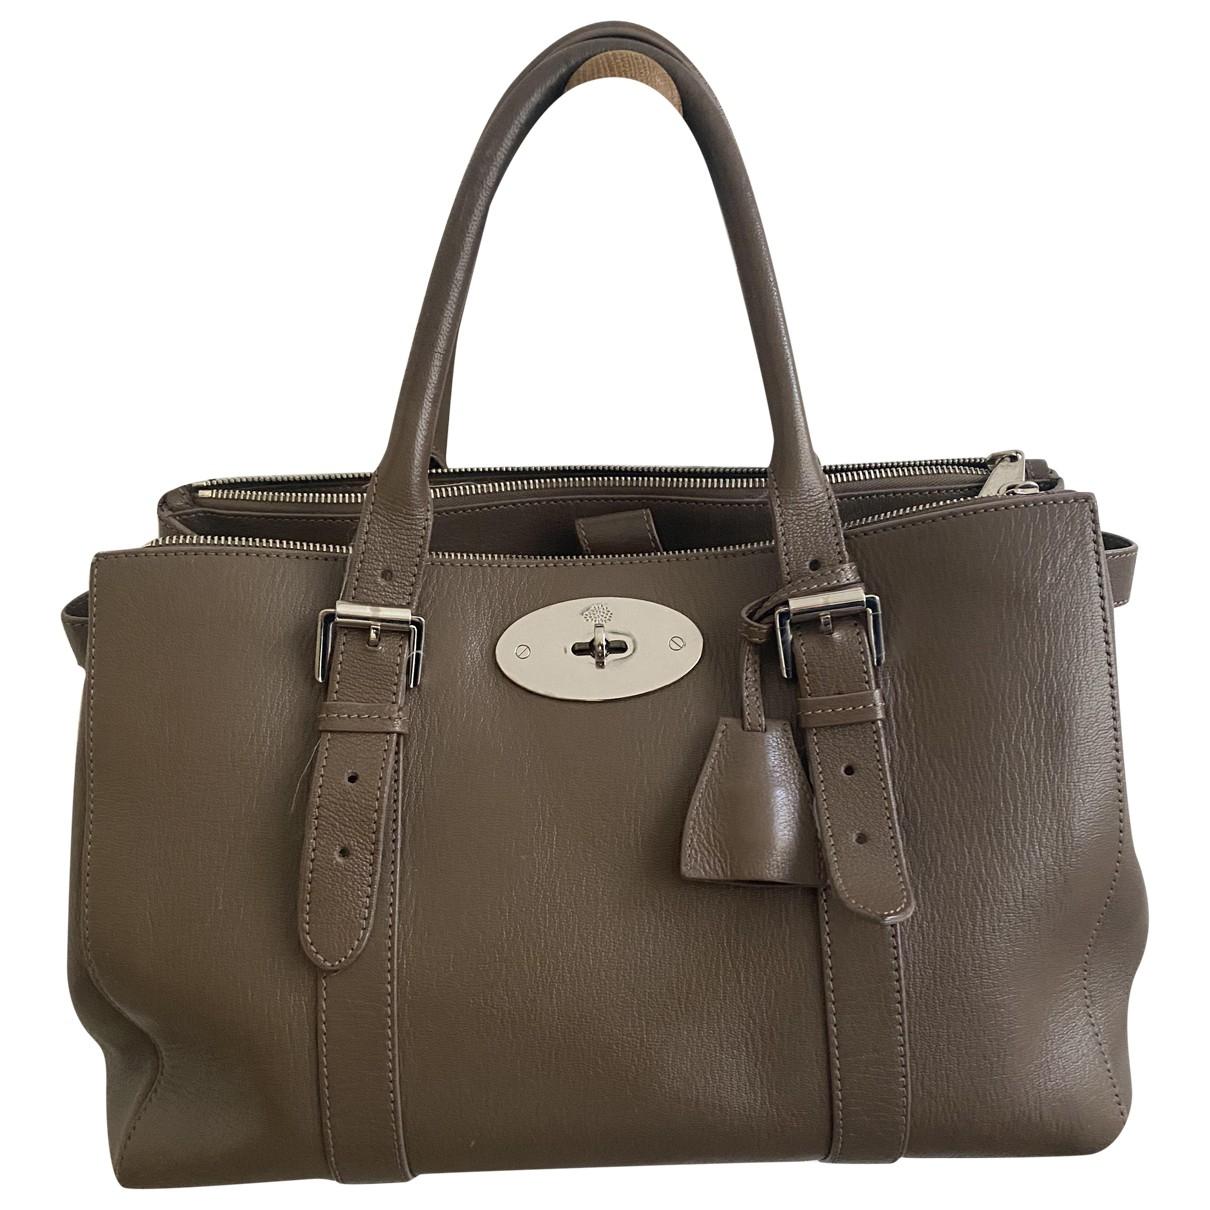 Mulberry \N Grey Leather handbag for Women \N